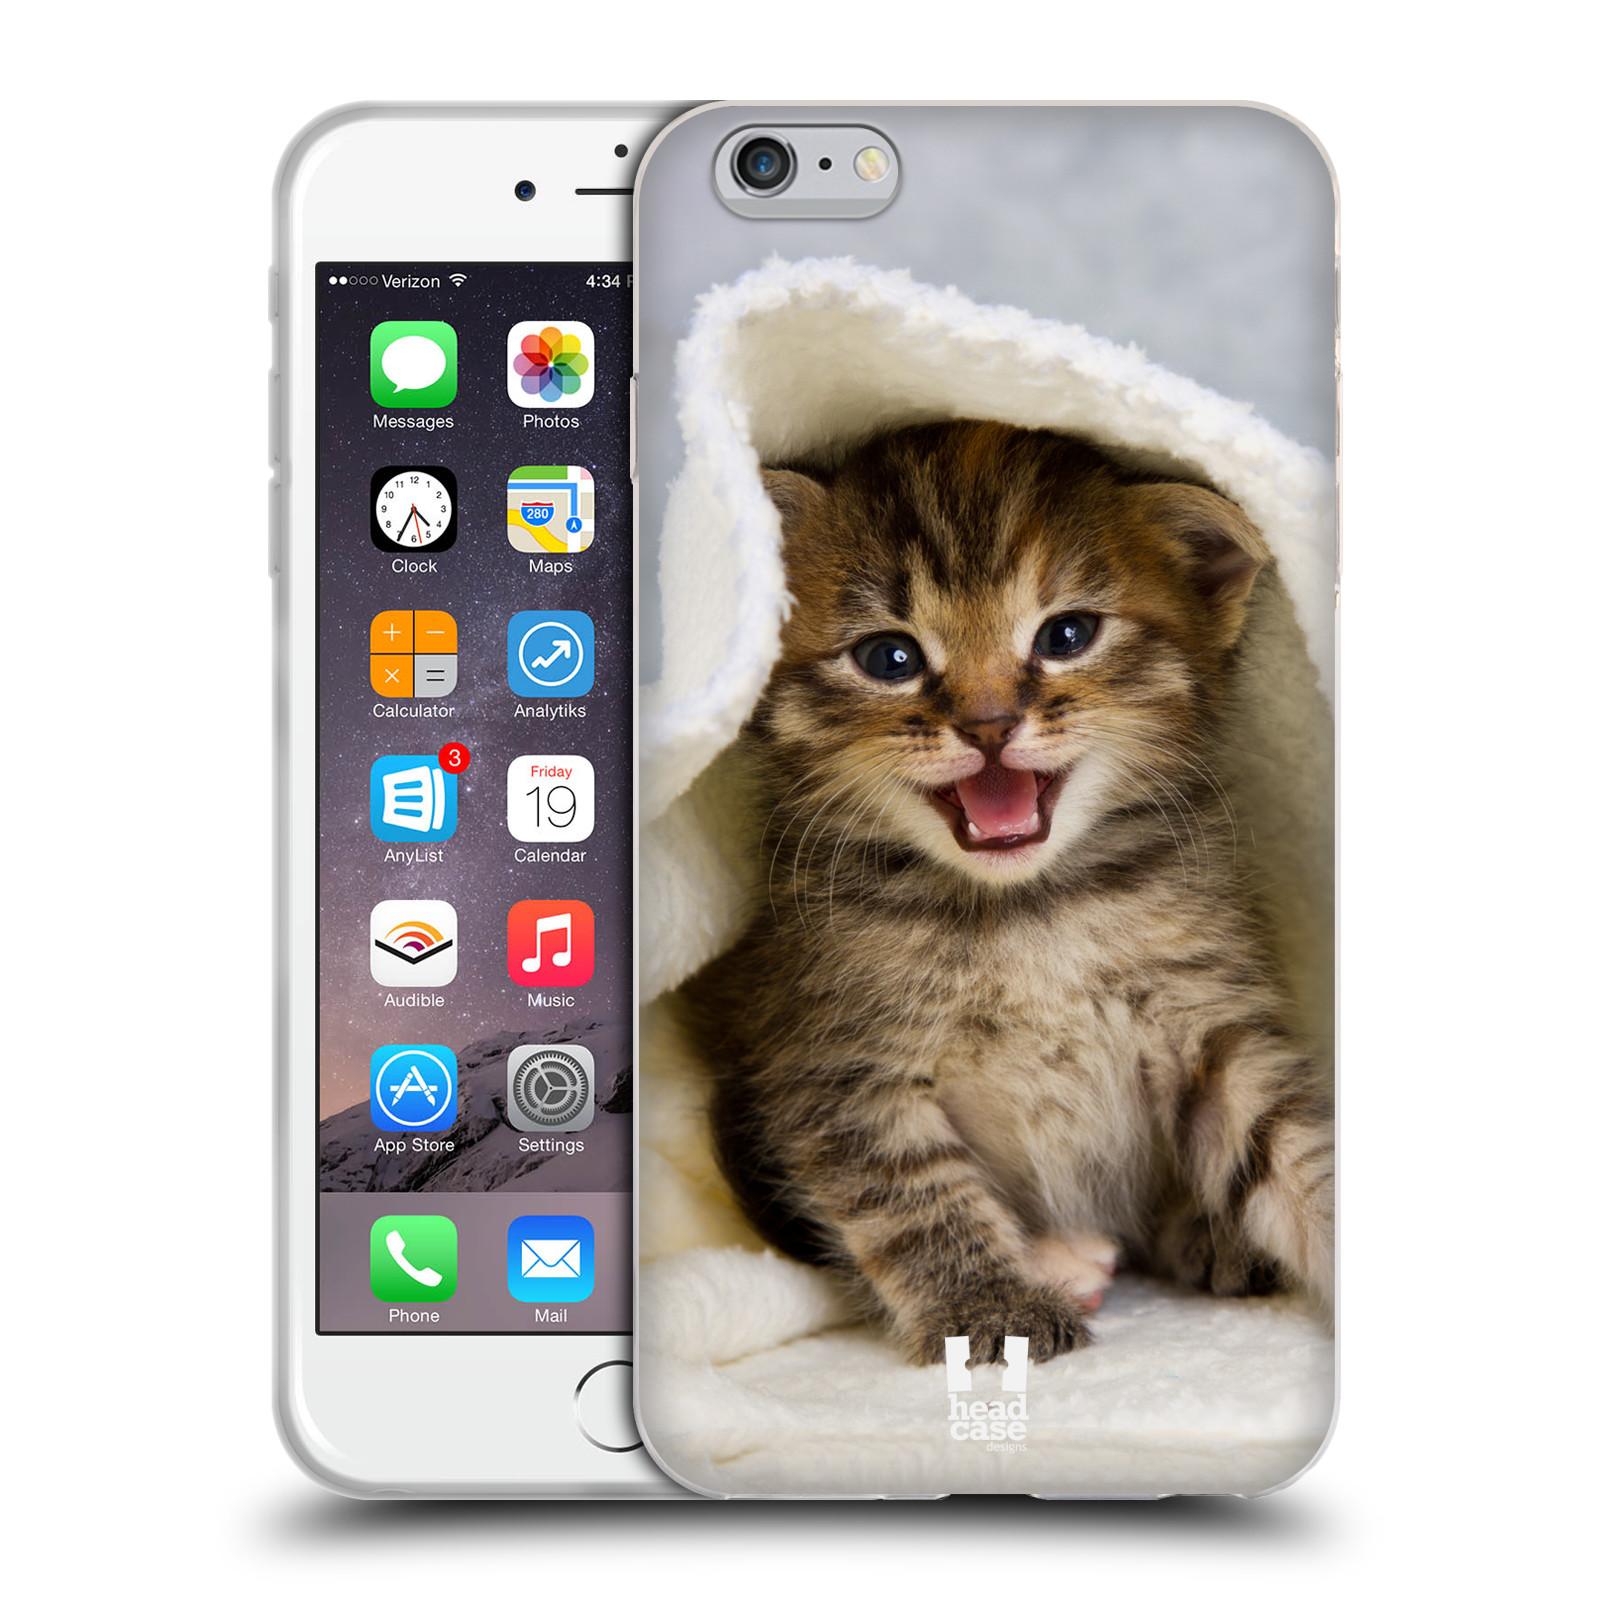 HEAD CASE silikonový obal na mobil Apple Iphone 6 PLUS/ 6S PLUS vzor Kočičky koťata foto kotě v ručníku